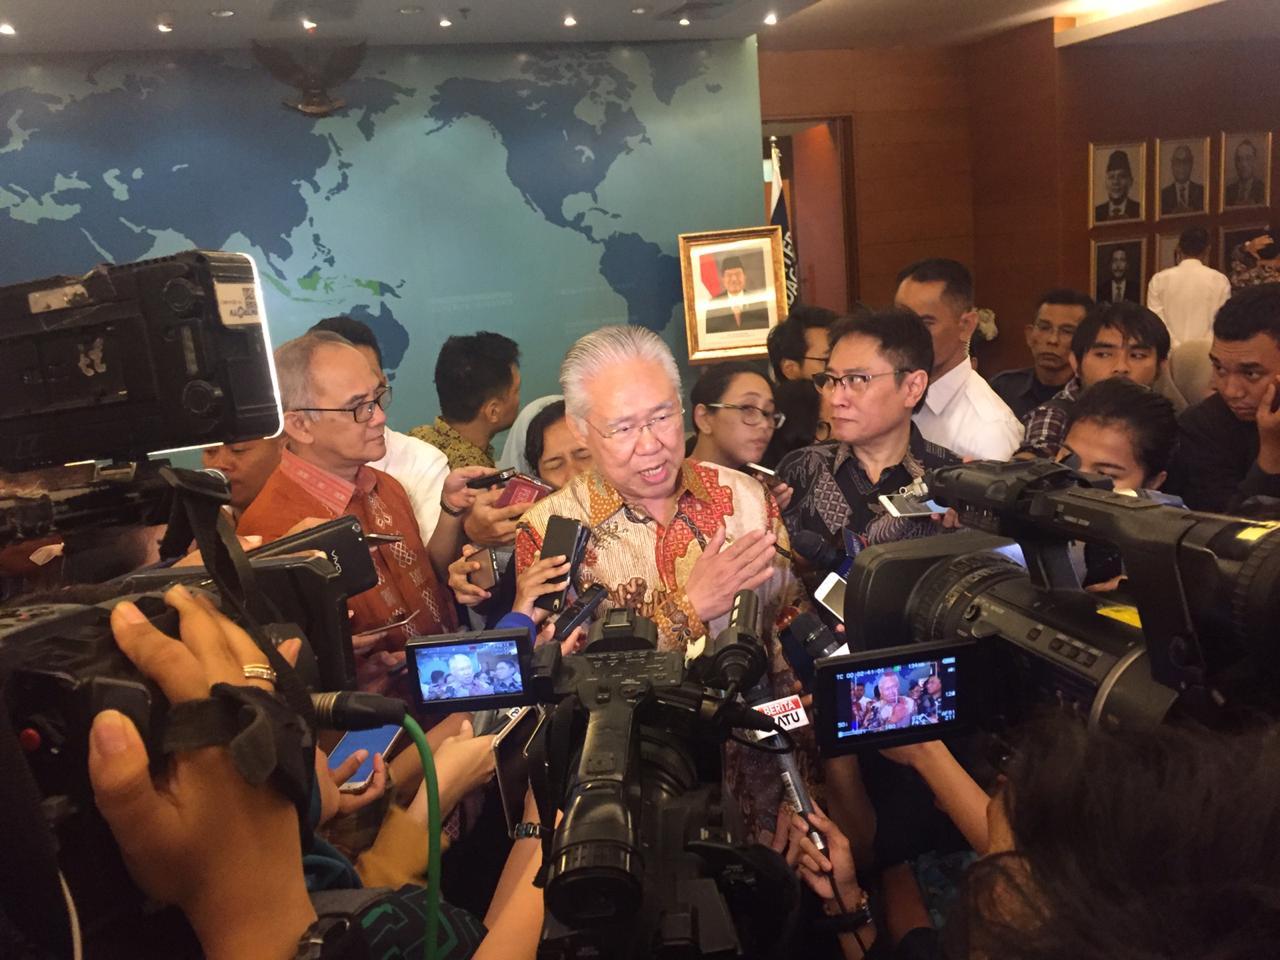 https: img-z.okeinfo.net content 2019 08 16 320 2092723 sawit-indonesia-kena-bea-masuk-mendag-kirim-nota-keberatan-ke-uni-eropa-RwoKKrRVXU.jpg